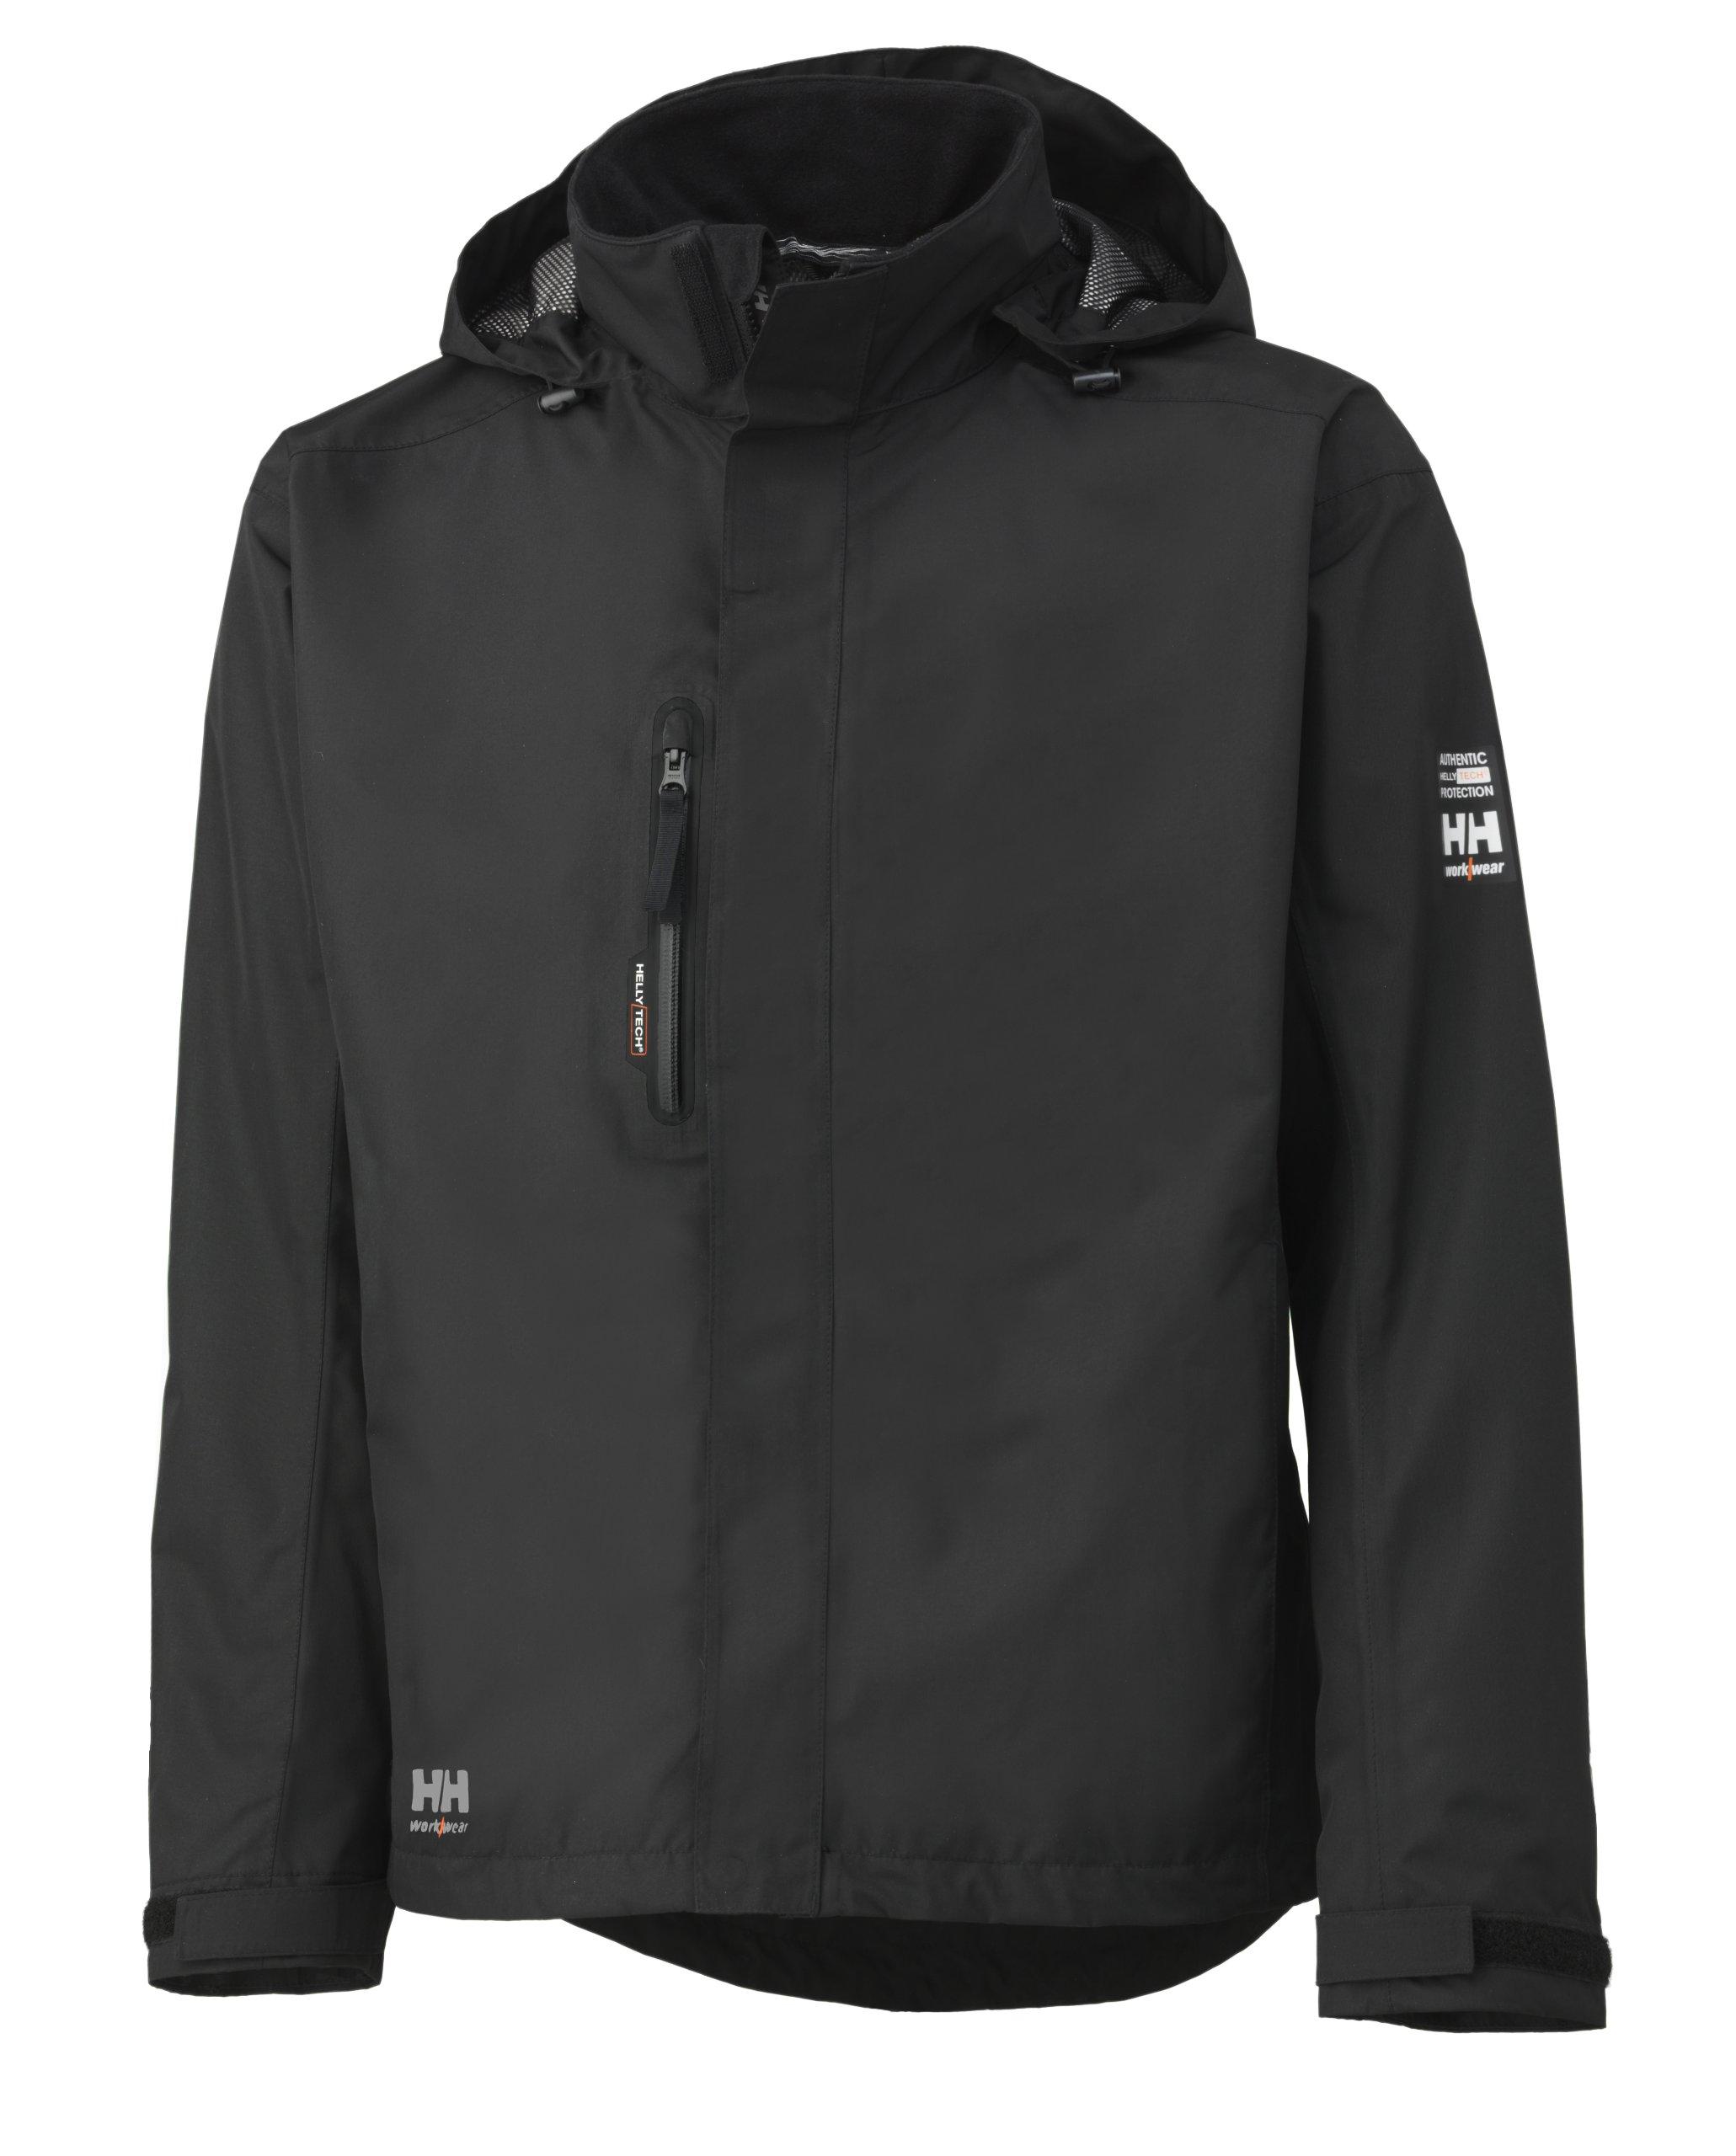 Helly Hansen Workwear Workwear Men's Haag Waterproof, Black, 4X-Large by Helly Hansen (Image #1)